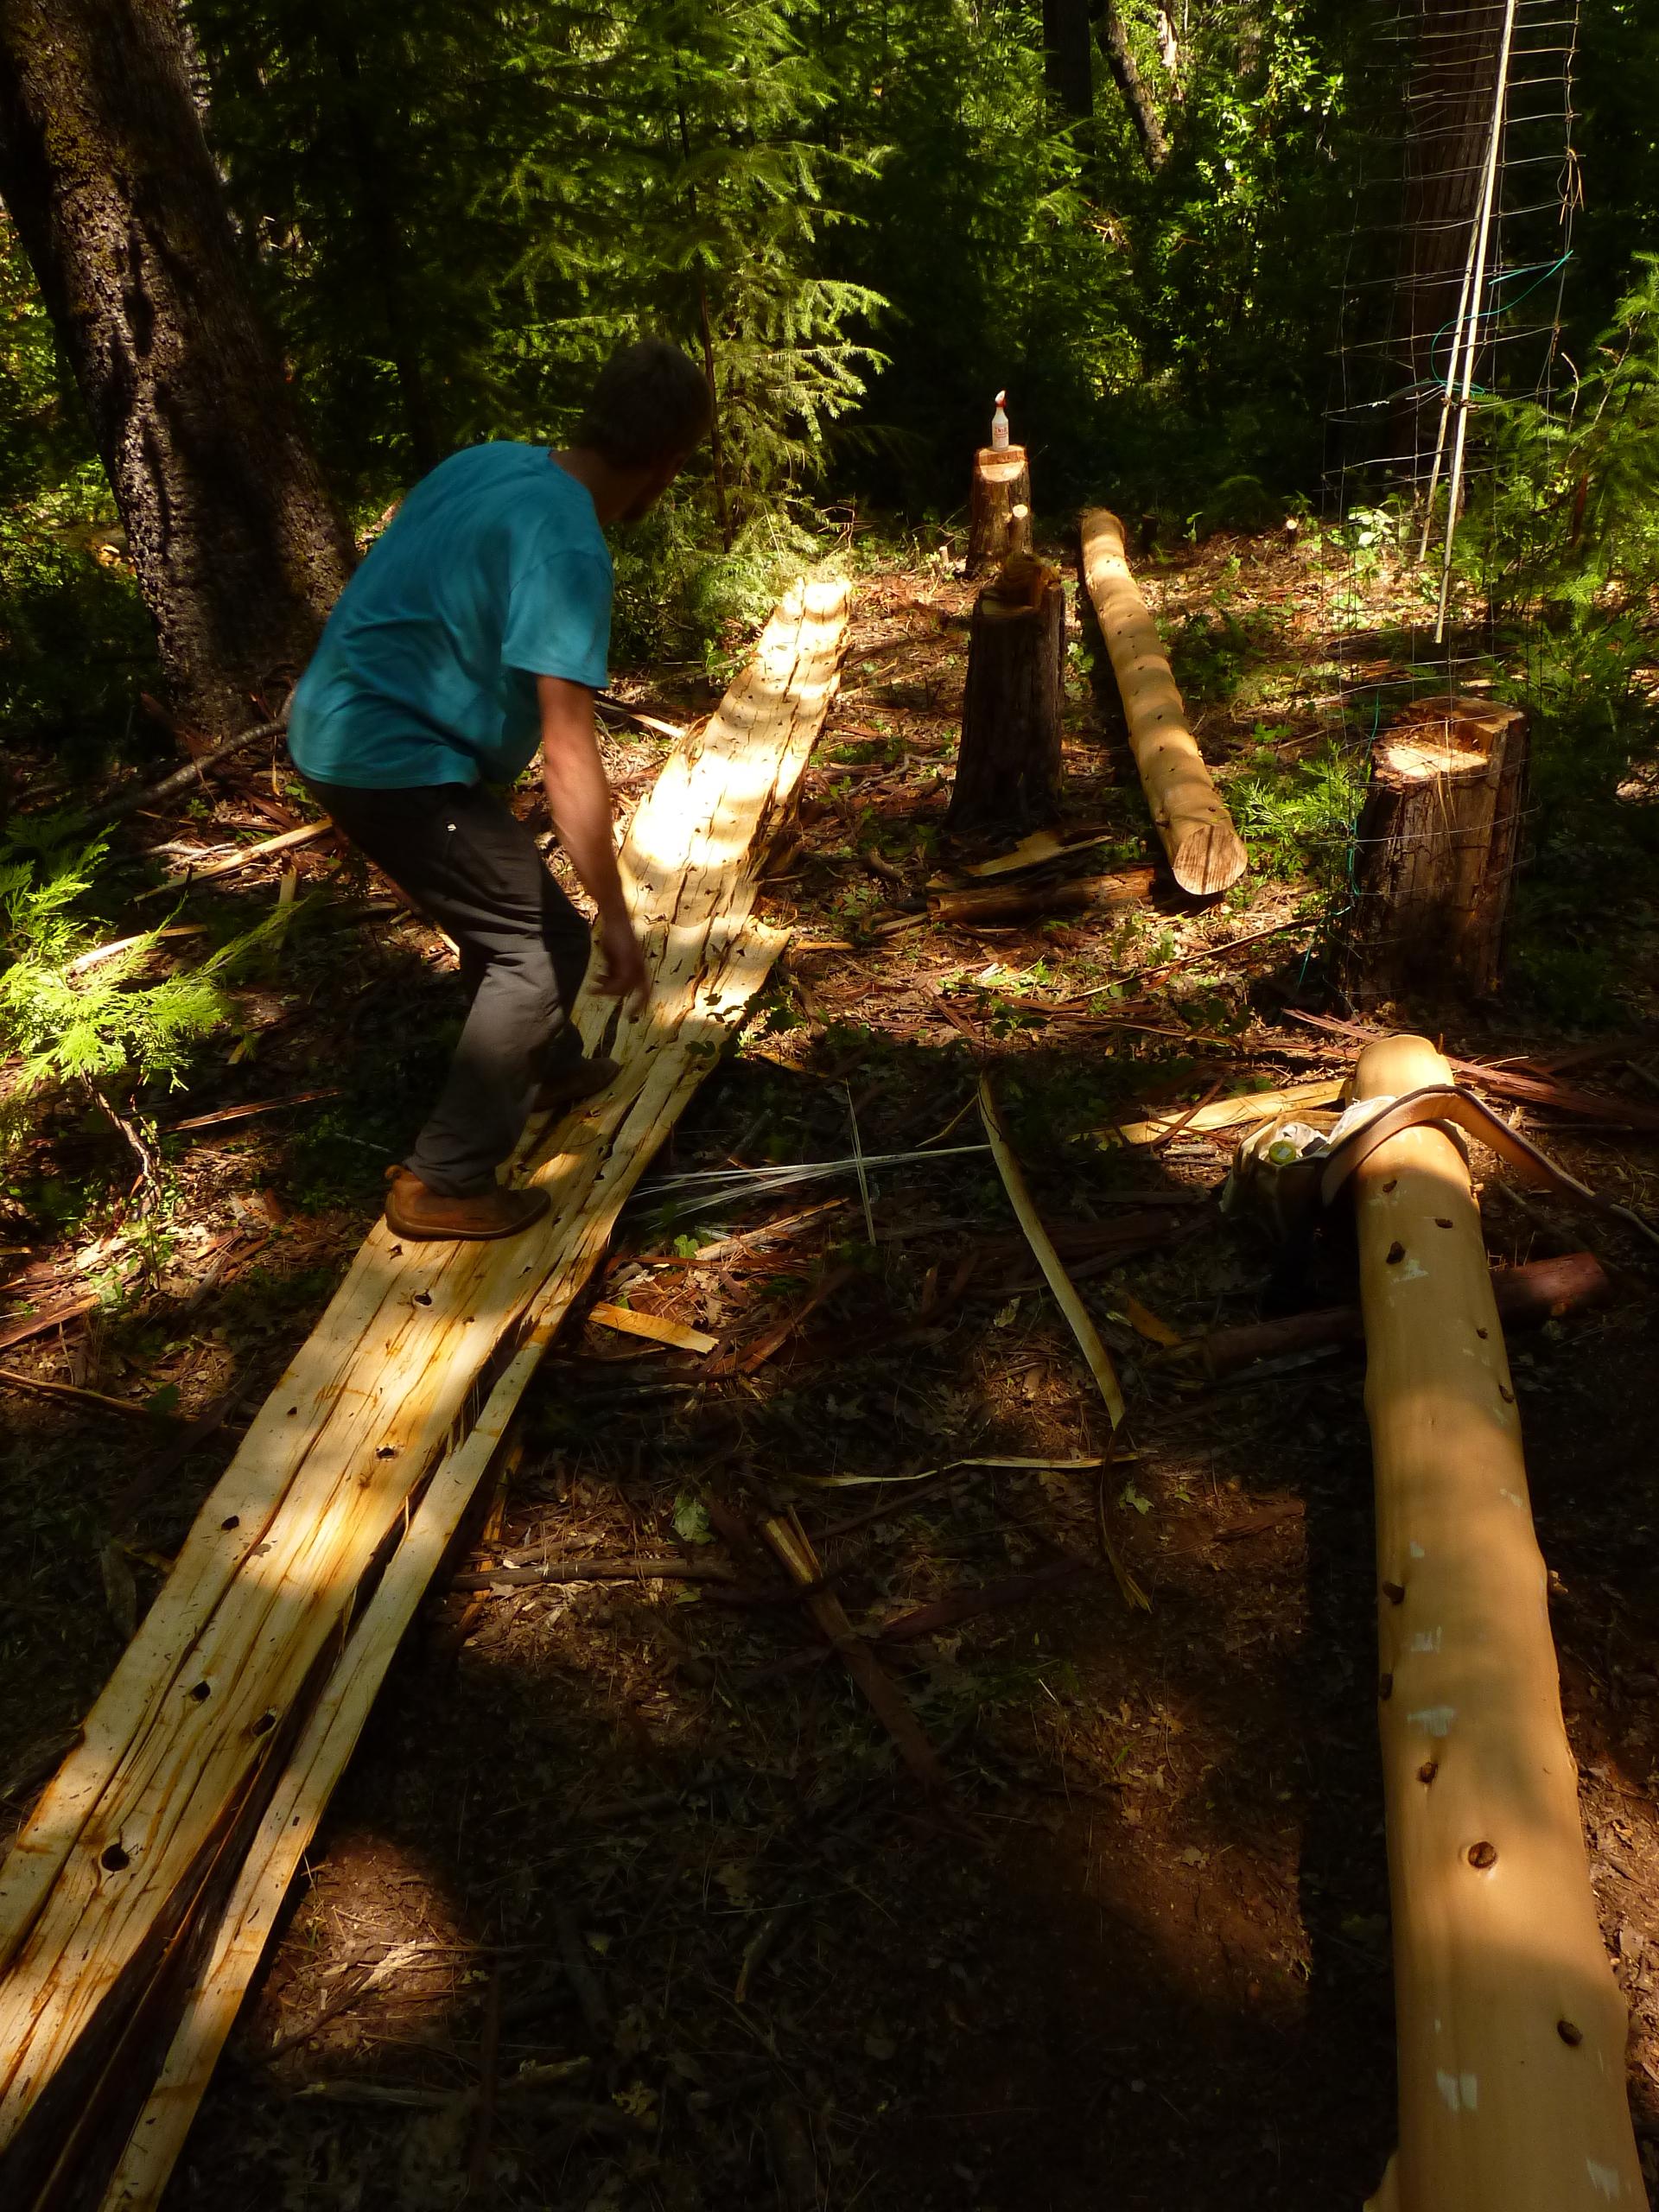 debarking cedars  oaks  and madrones